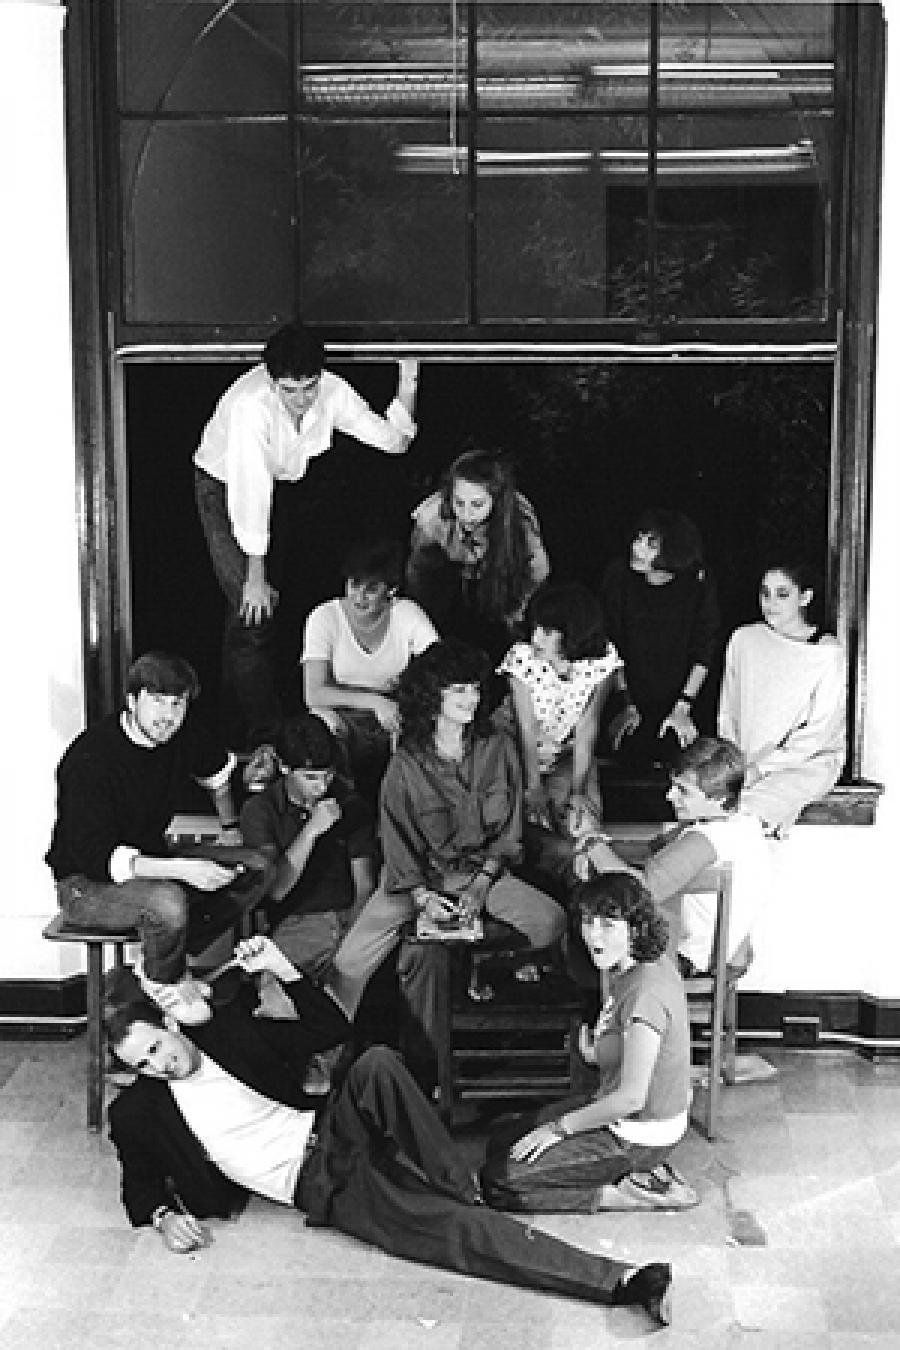 The Whistling Shrimp improv troupe in 1984